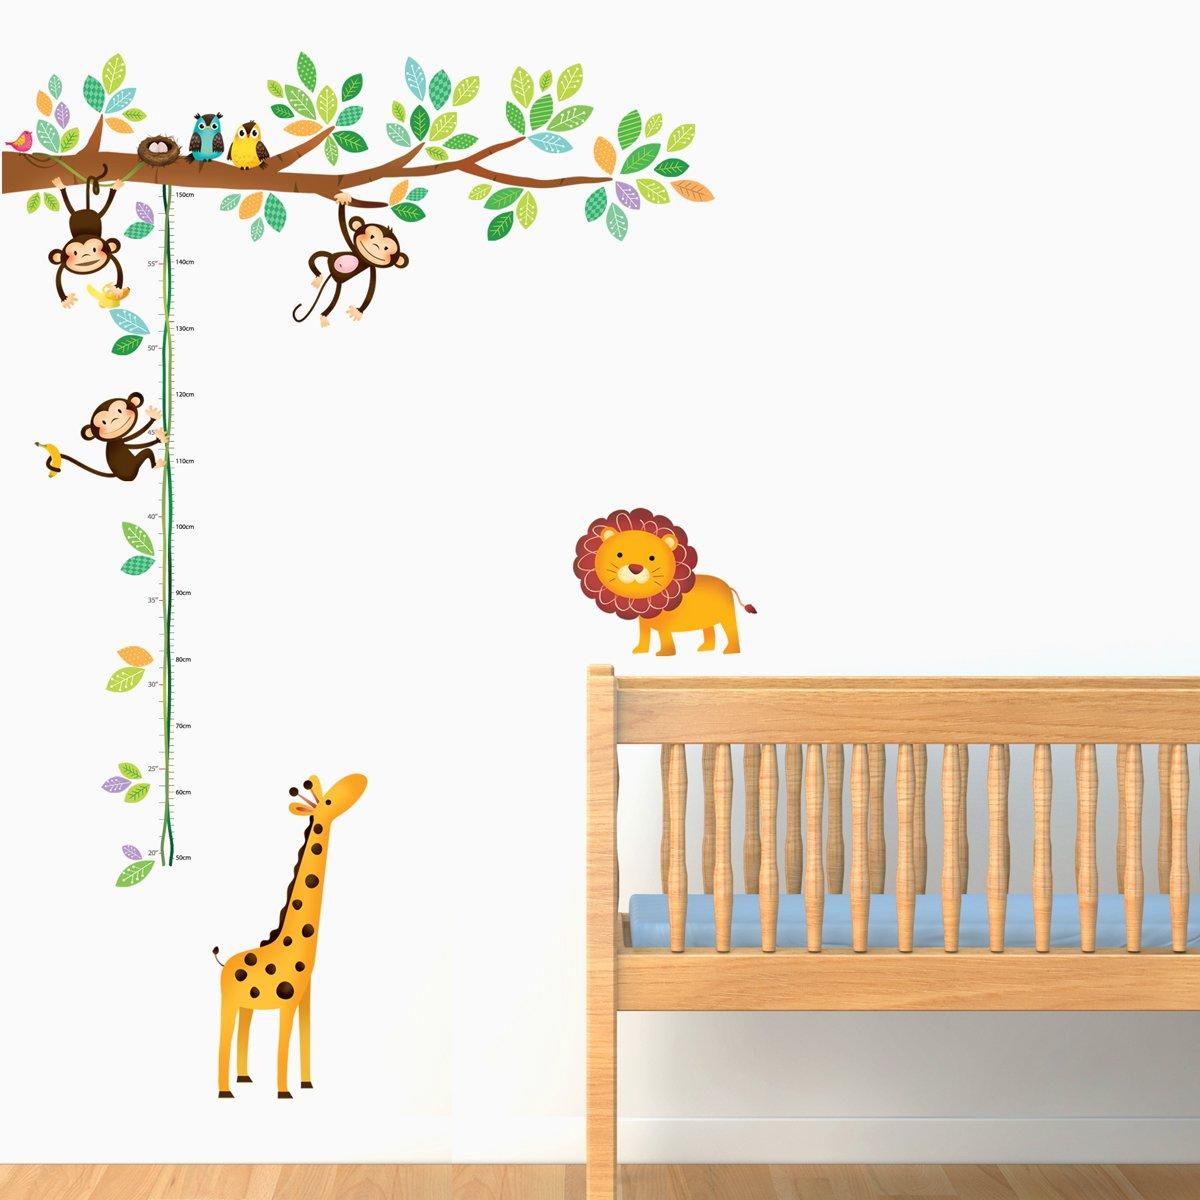 amazon com decowall dw 1402 little monkeys tree animals height amazon com decowall dw 1402 little monkeys tree animals height chart peel and stick nursery kids wall decals stickers home kitchen